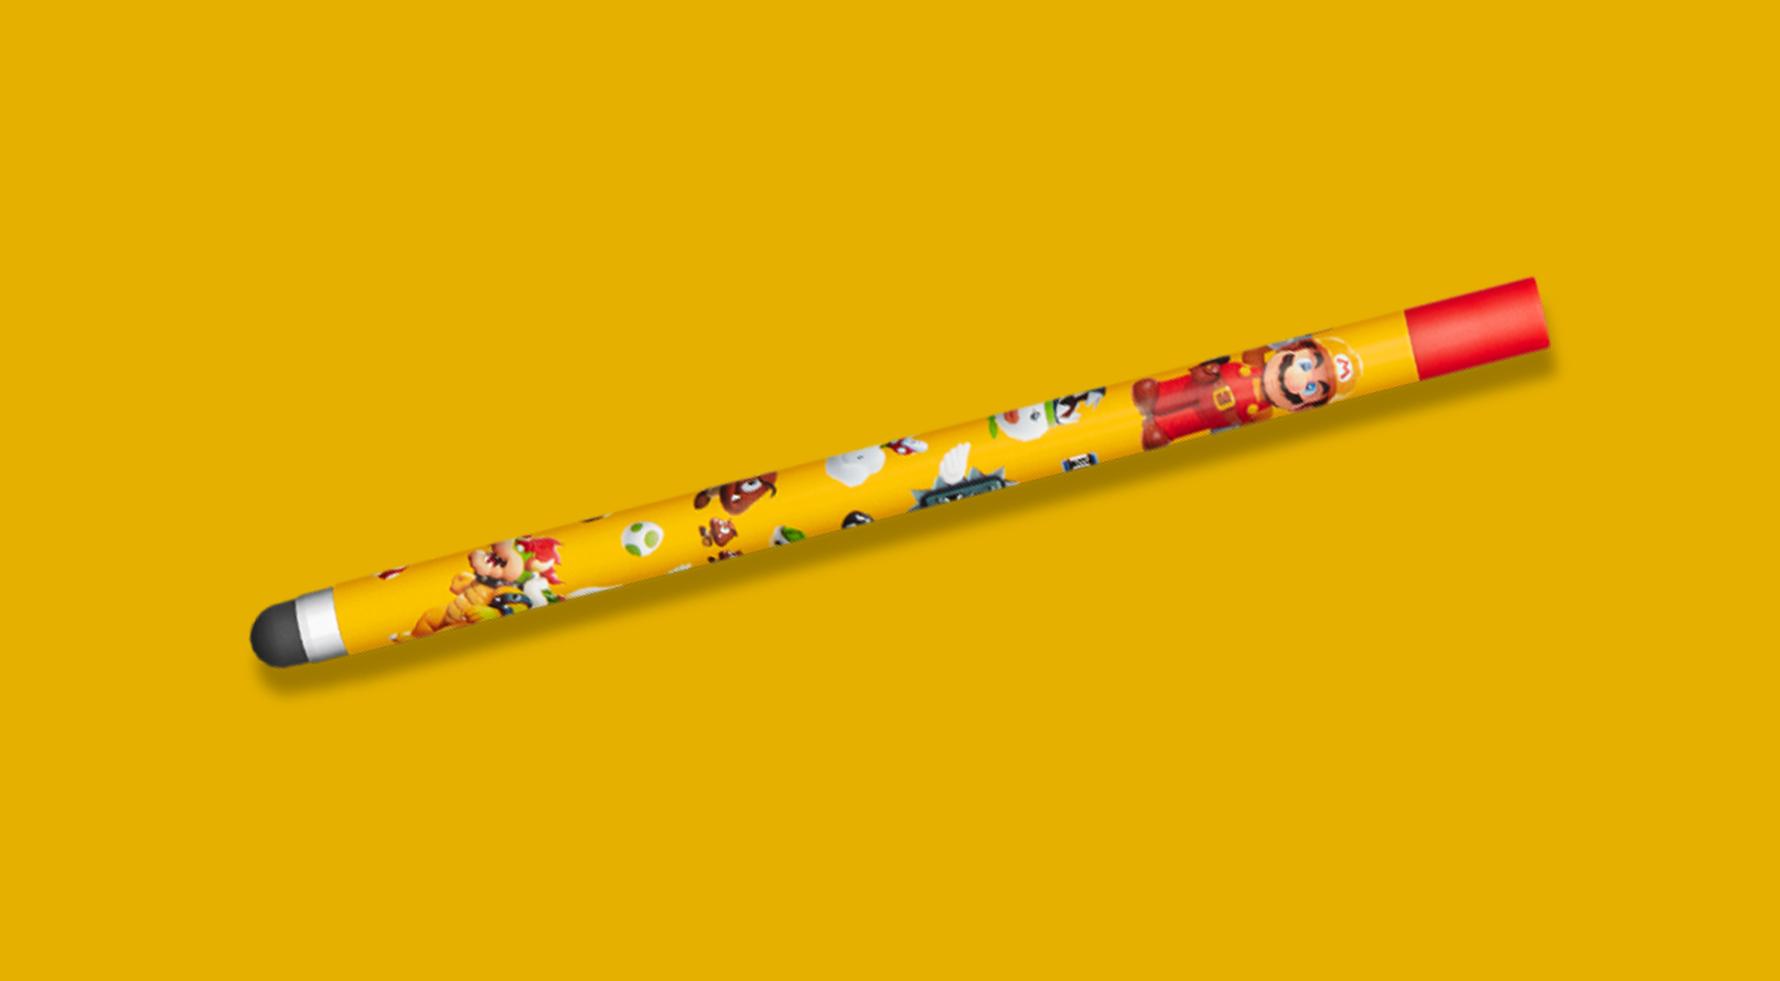 Европейские игроки получат преимущество в Super Mario Maker 2